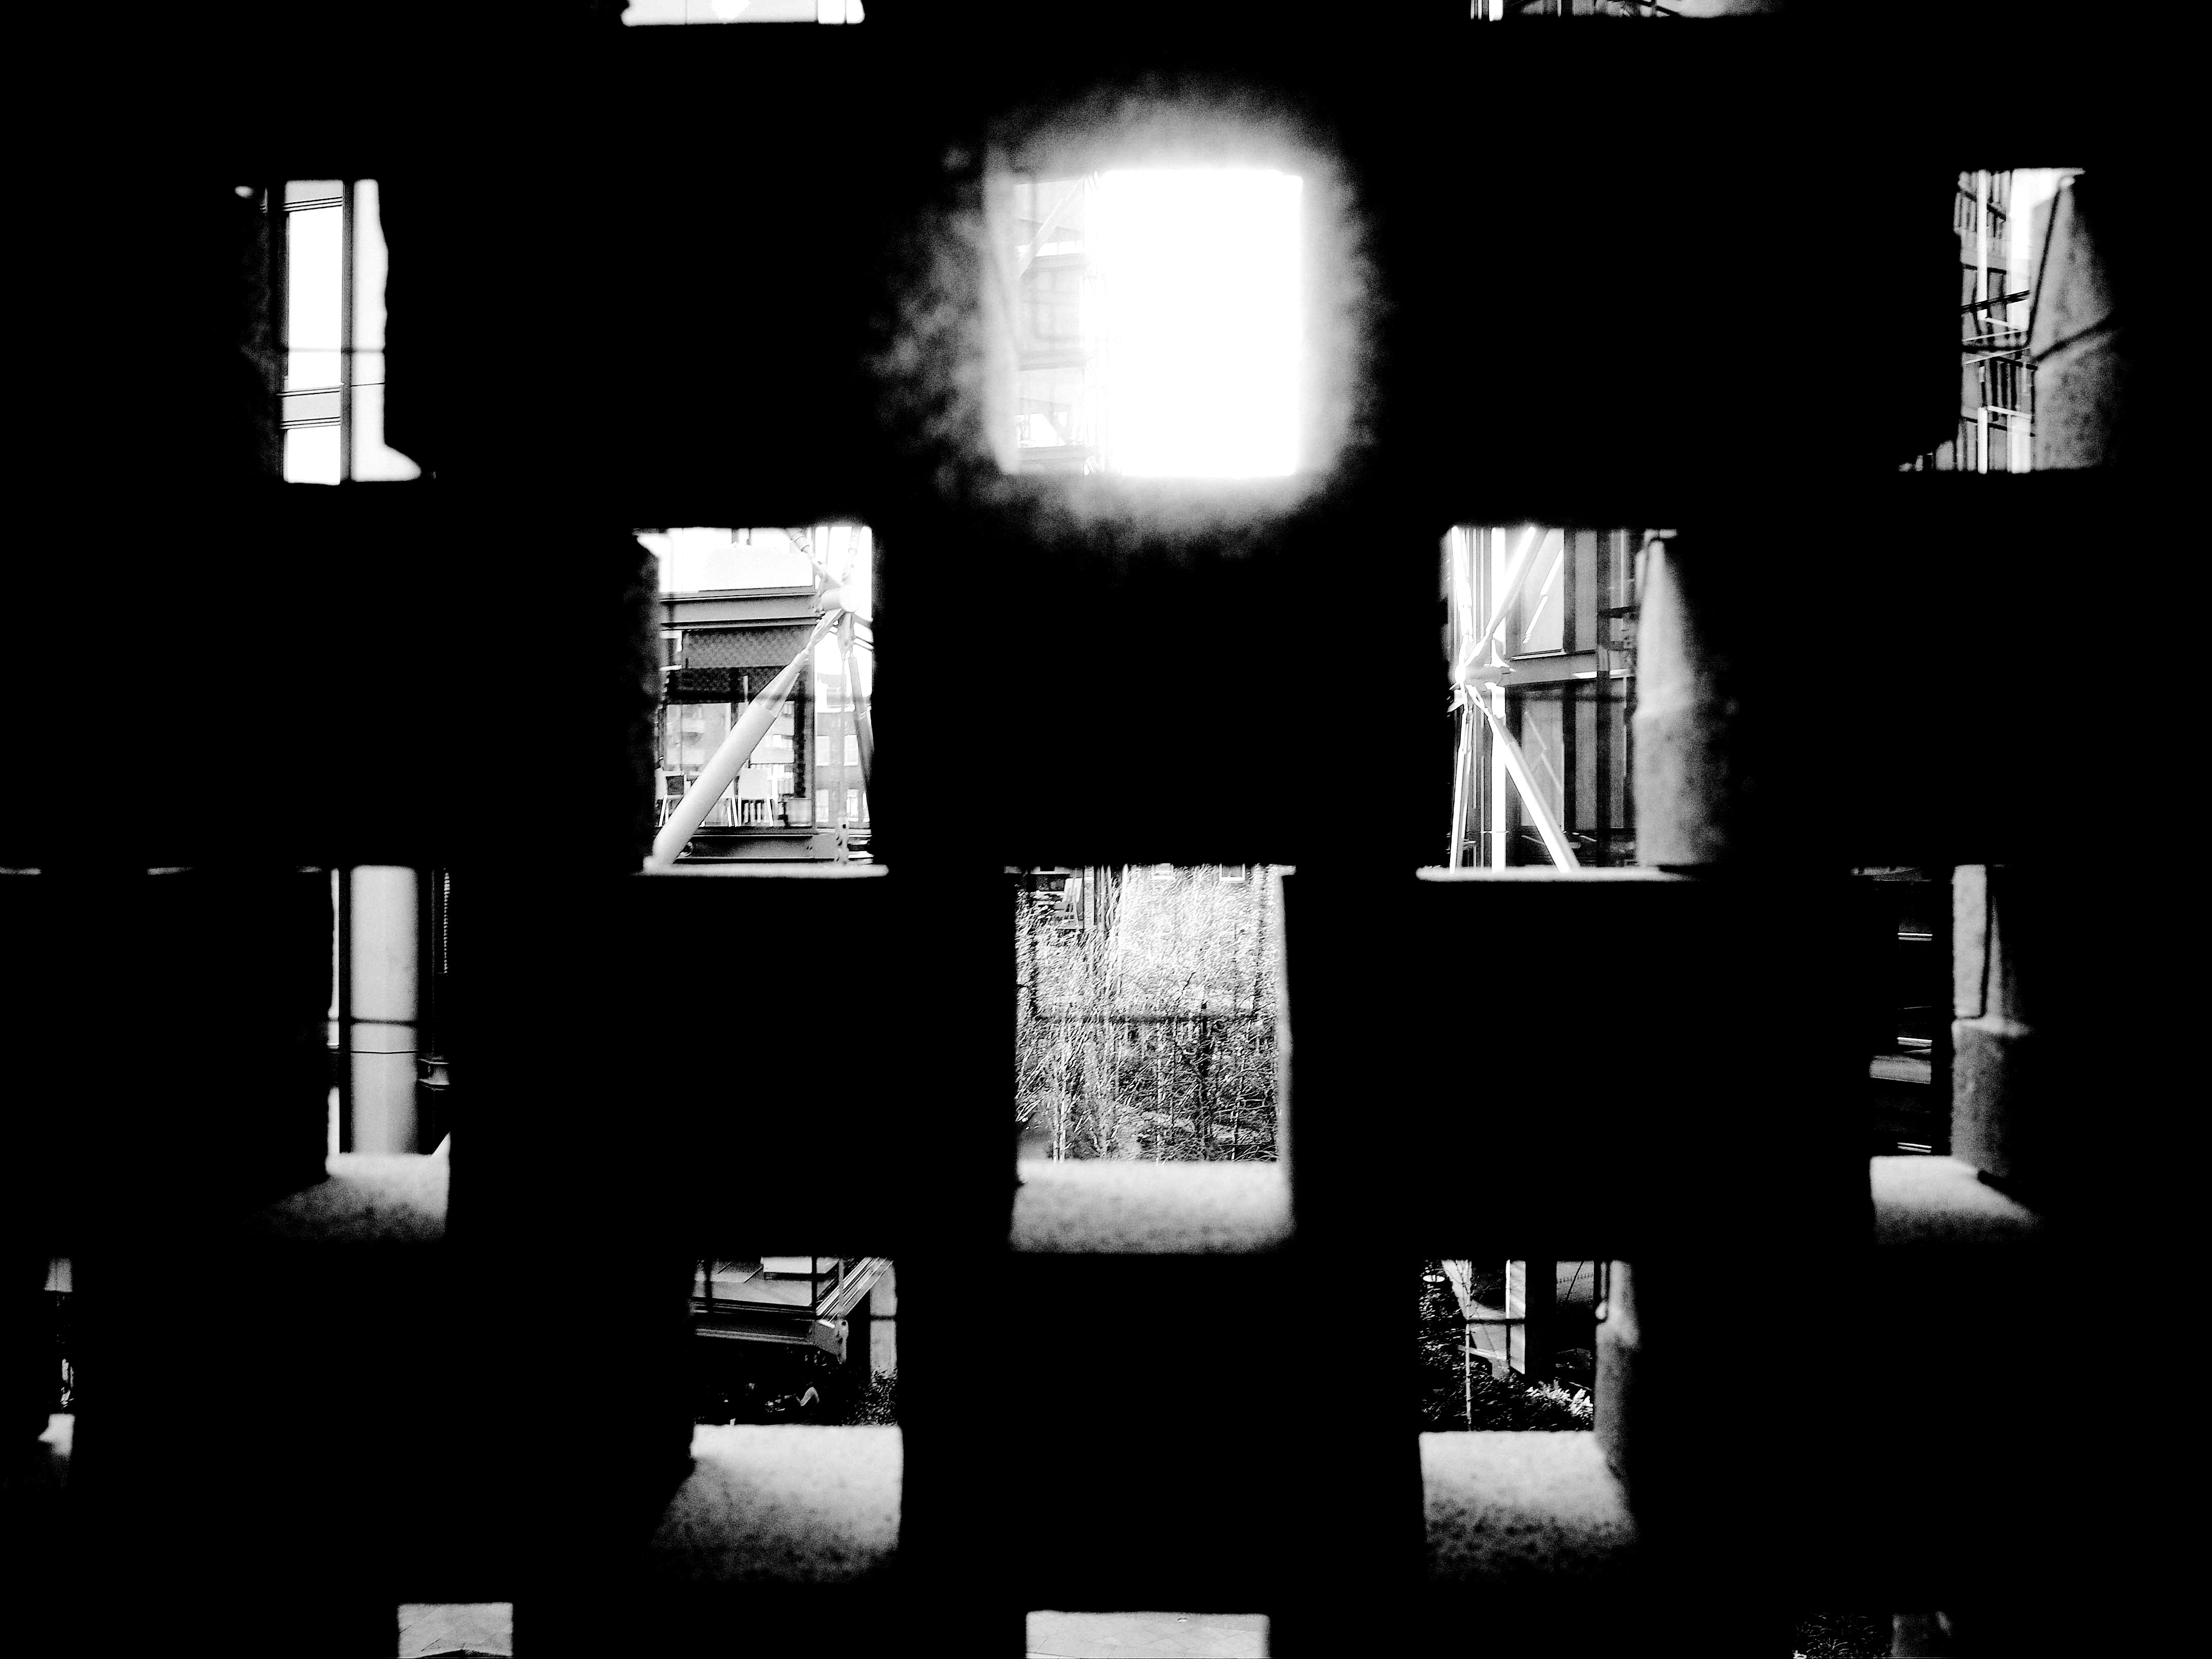 Tate Modern, London, December 2016